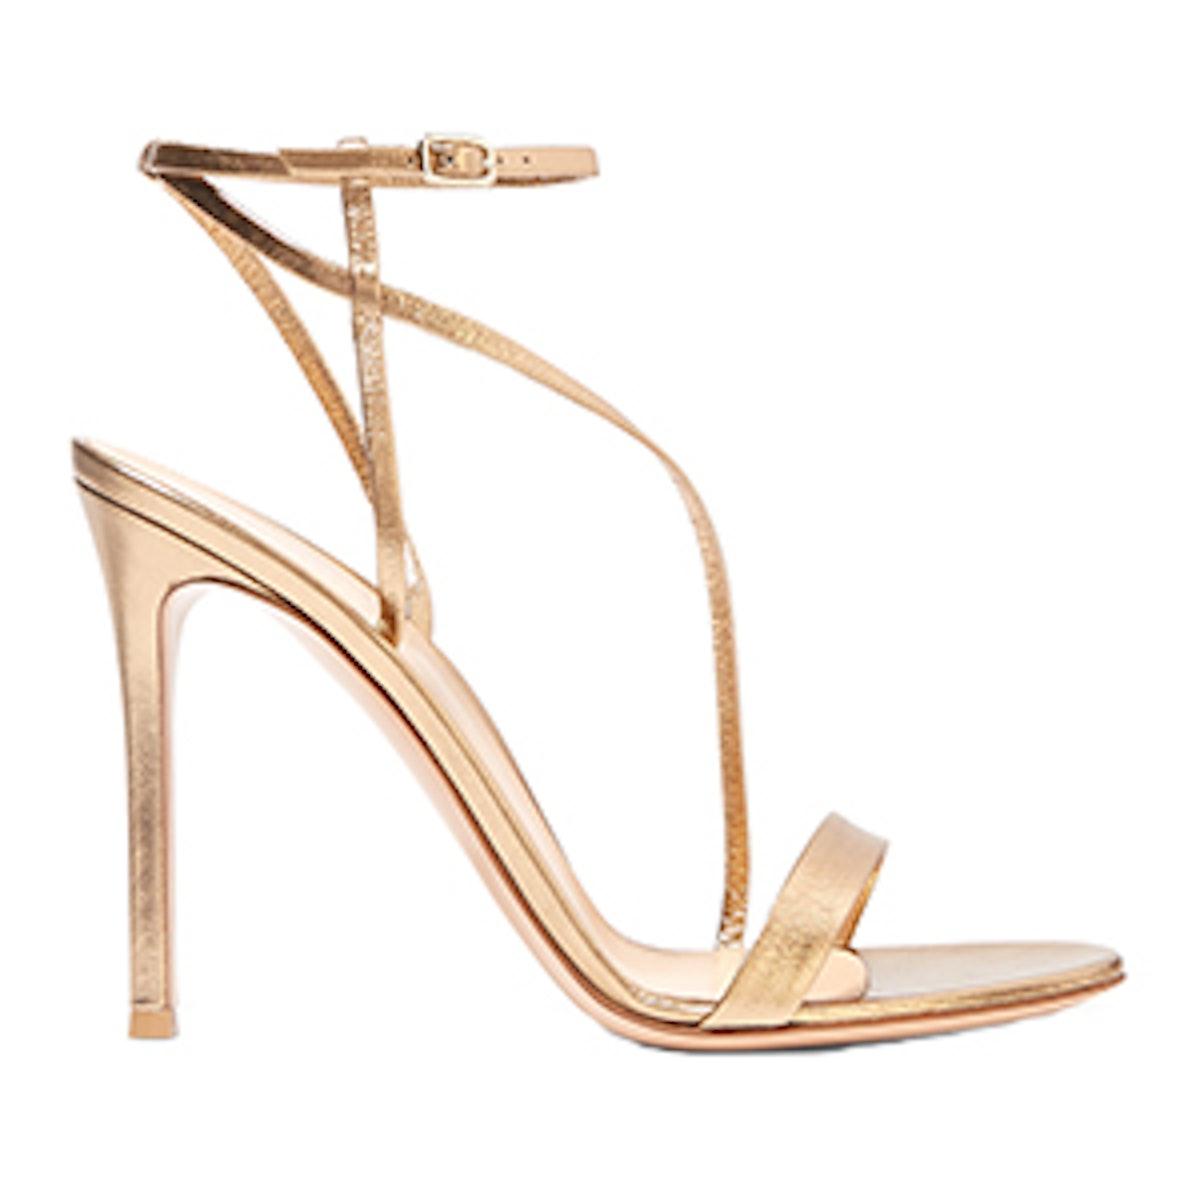 Metallic Leather Sandals